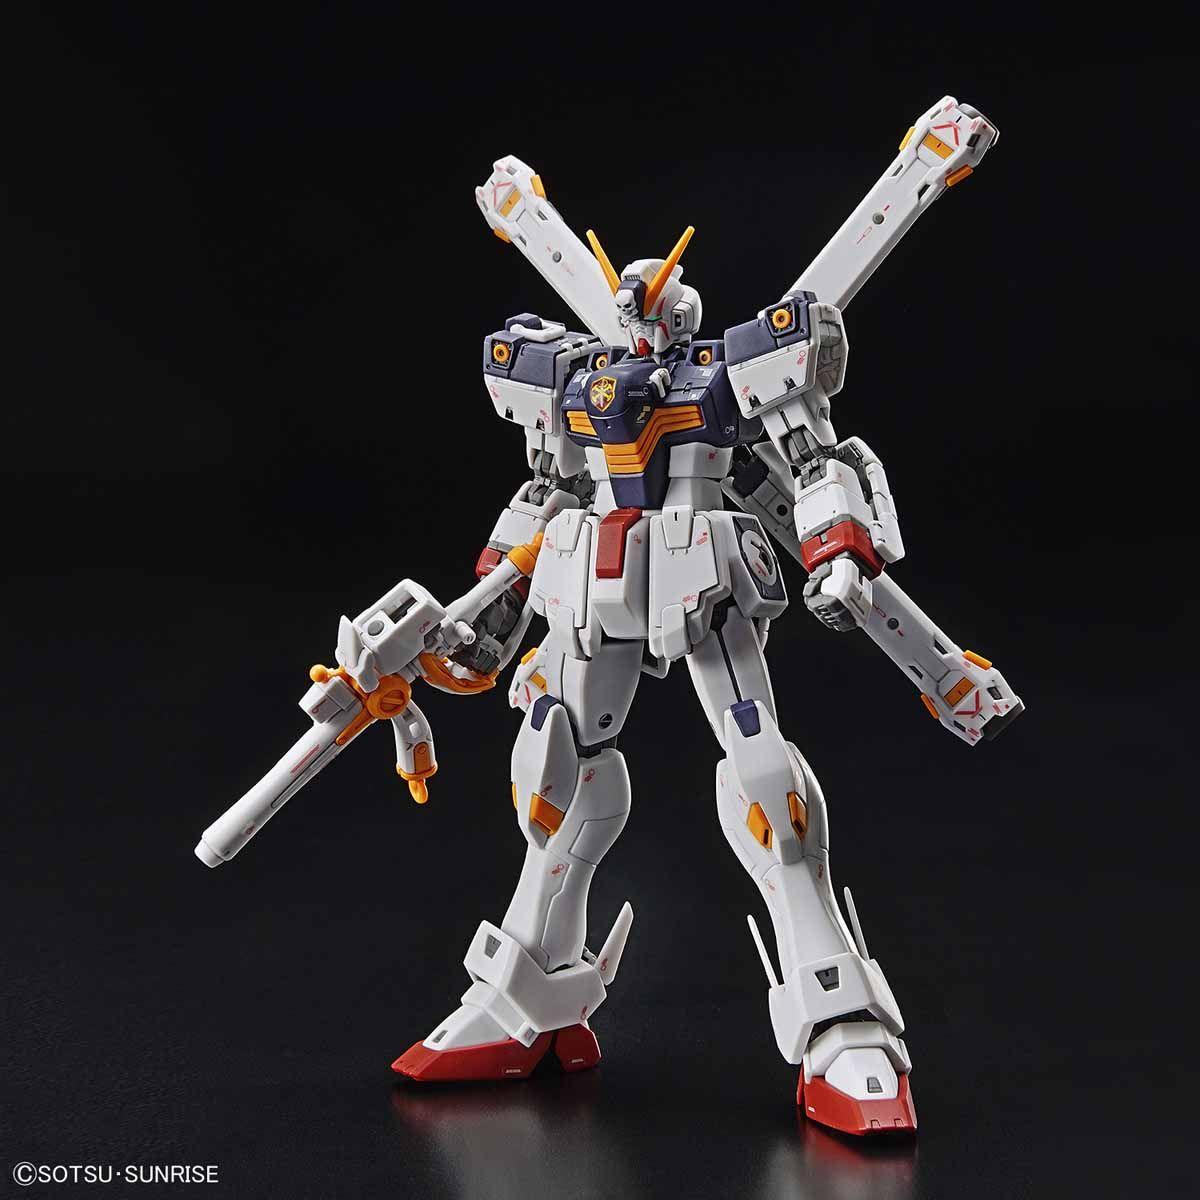 RG 1/144 XM-X1 クロスボーン・ガンダムX1 [Crossbone Gundam X-1] JAN:4573102576170 5057617